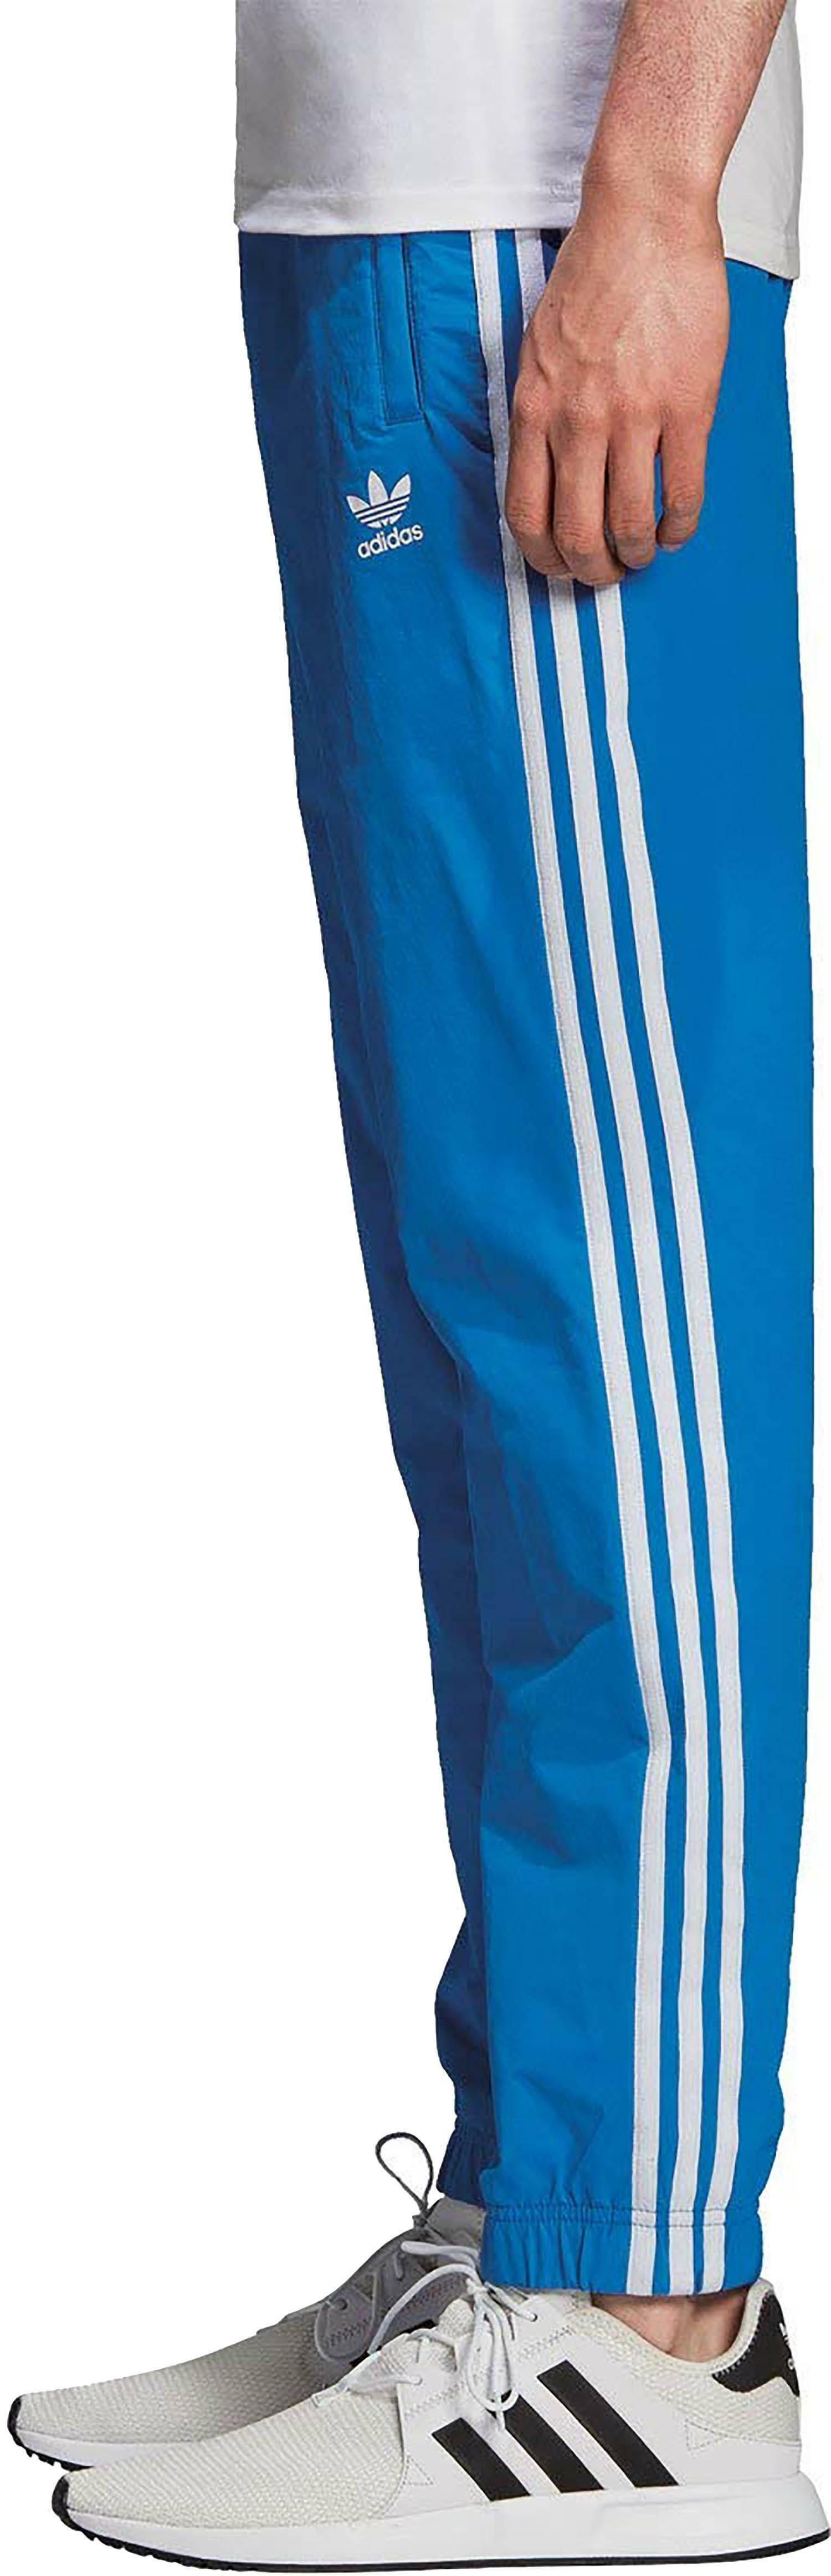 adidas adidas warm-up tp pantaloni tuta uomo blu dh5765